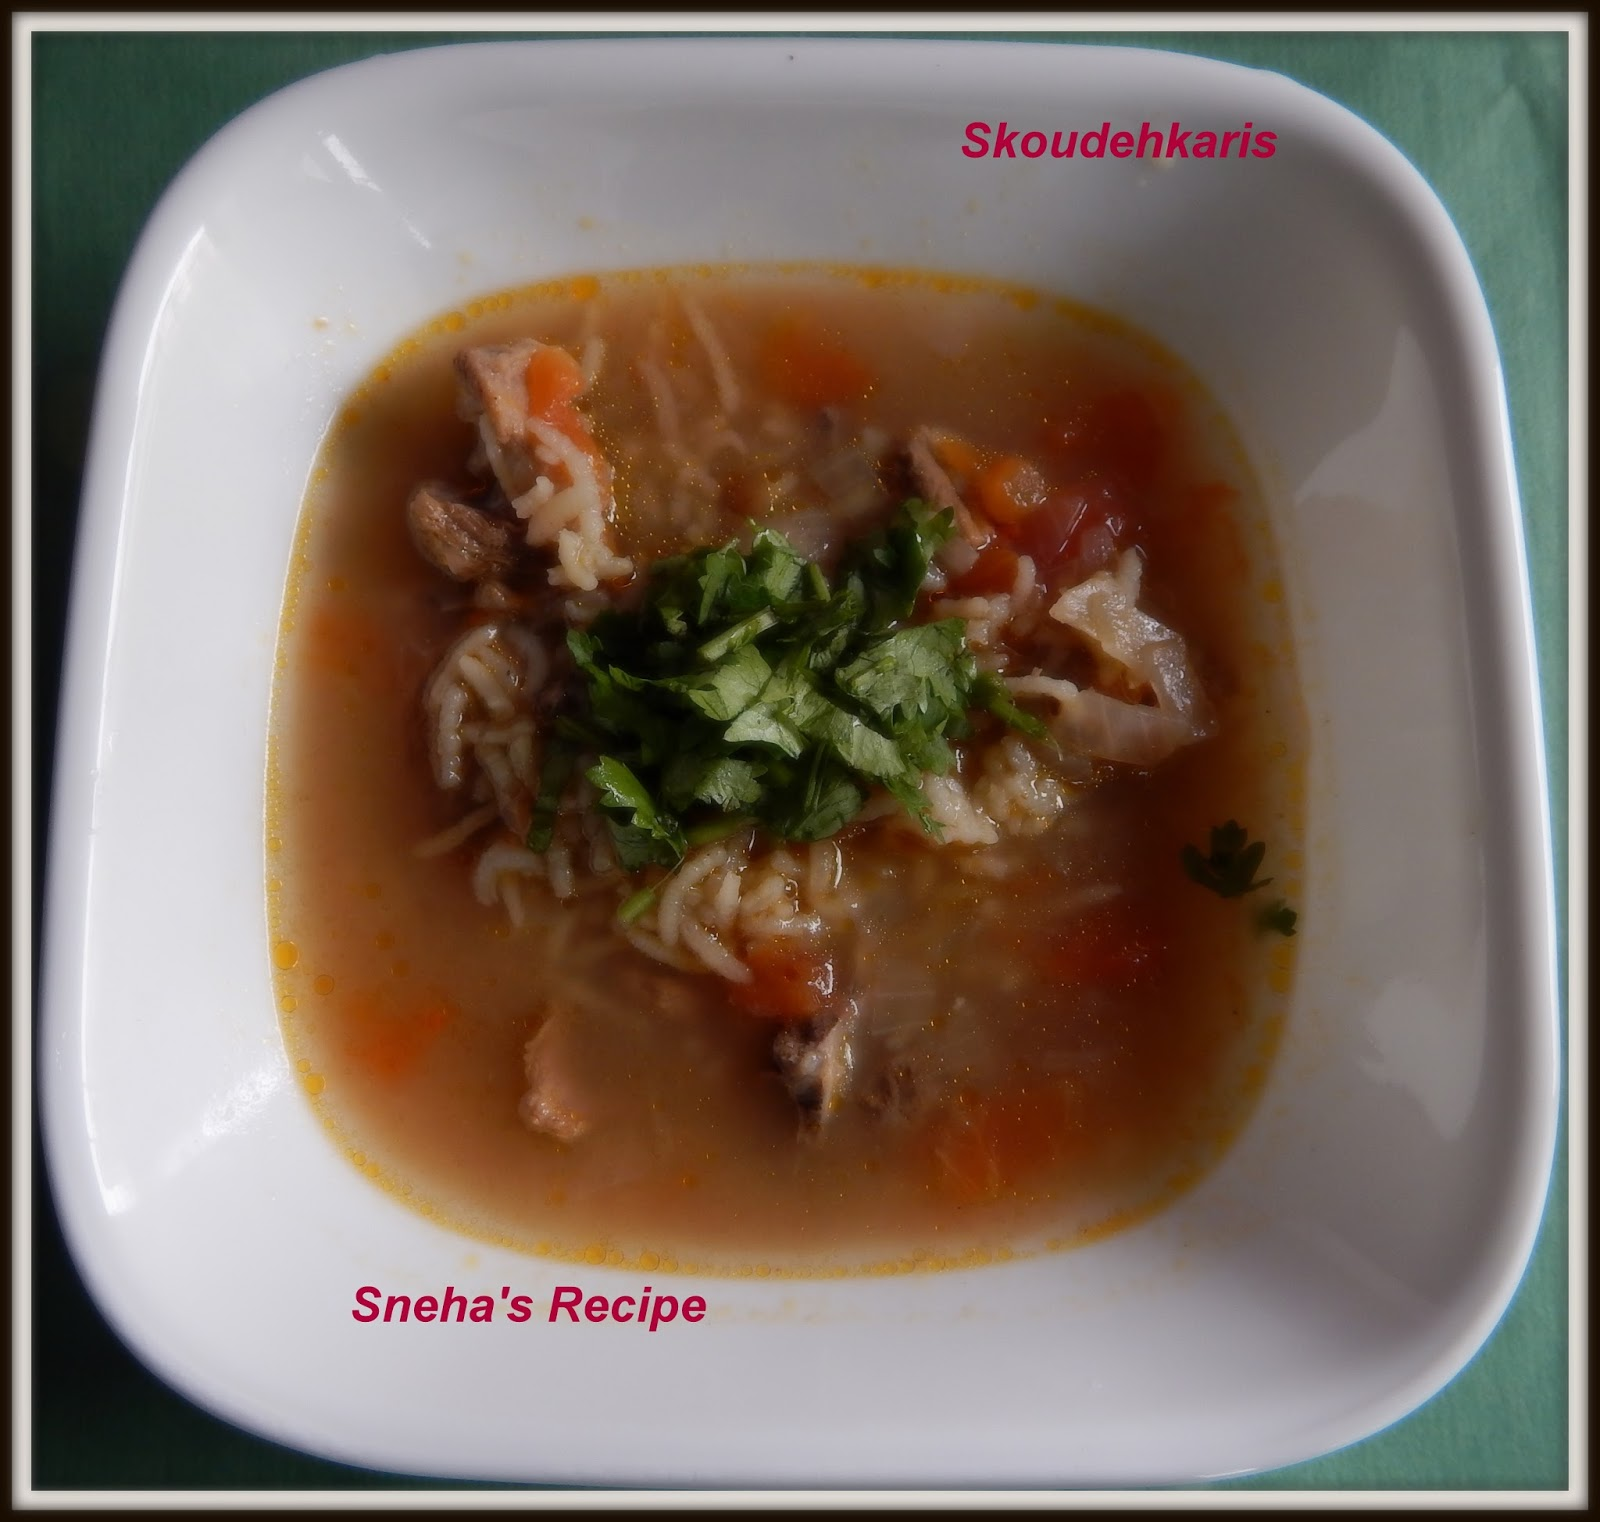 Skoudehkaris - Sneha's Recipe